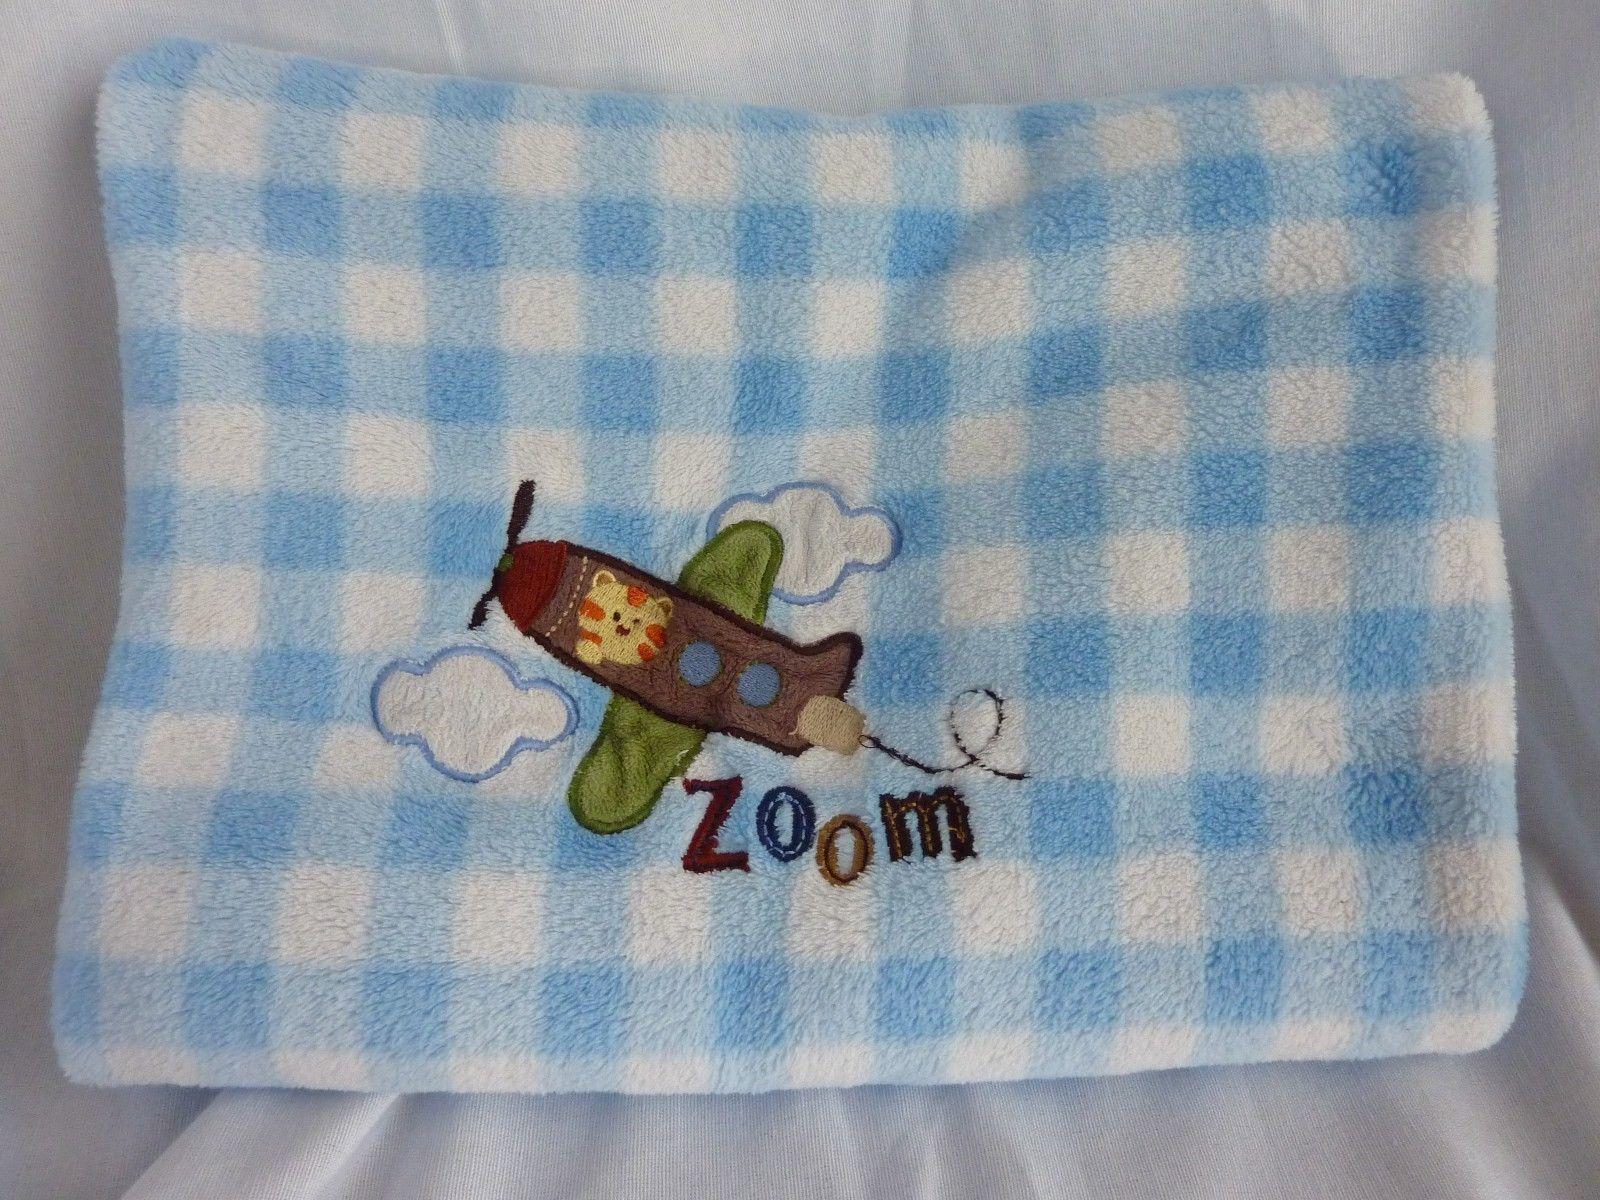 e87e721b7cf Garanimals ZOOM Airplane Baby Blanket Blue White Gingham Check Security  Lovey - $18.57